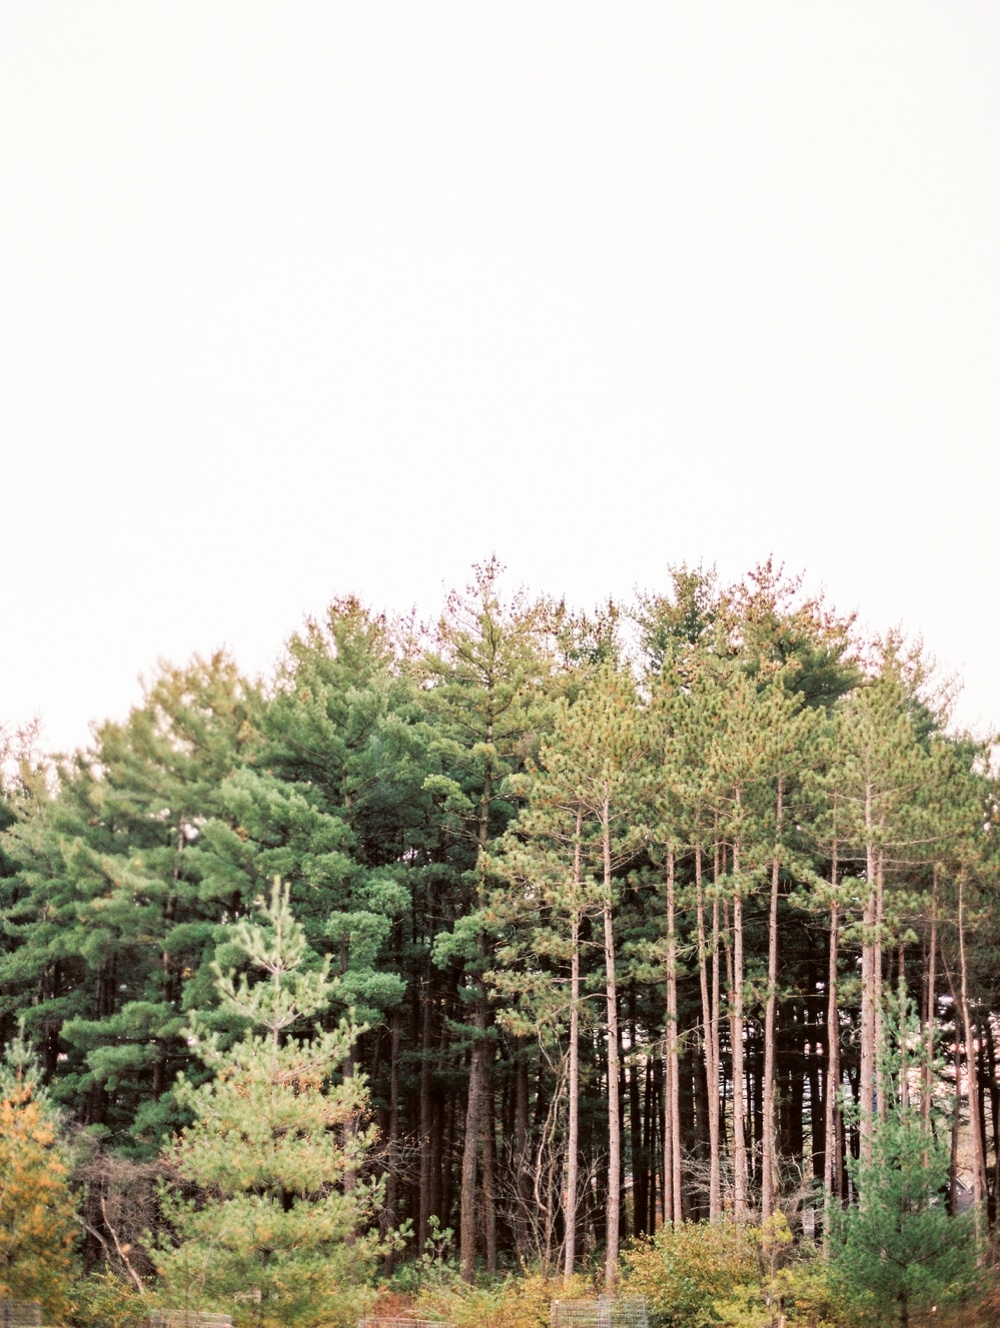 Kristin-La-Voie-Photography-morton-arboretum-chicago-wedding-photographer-101